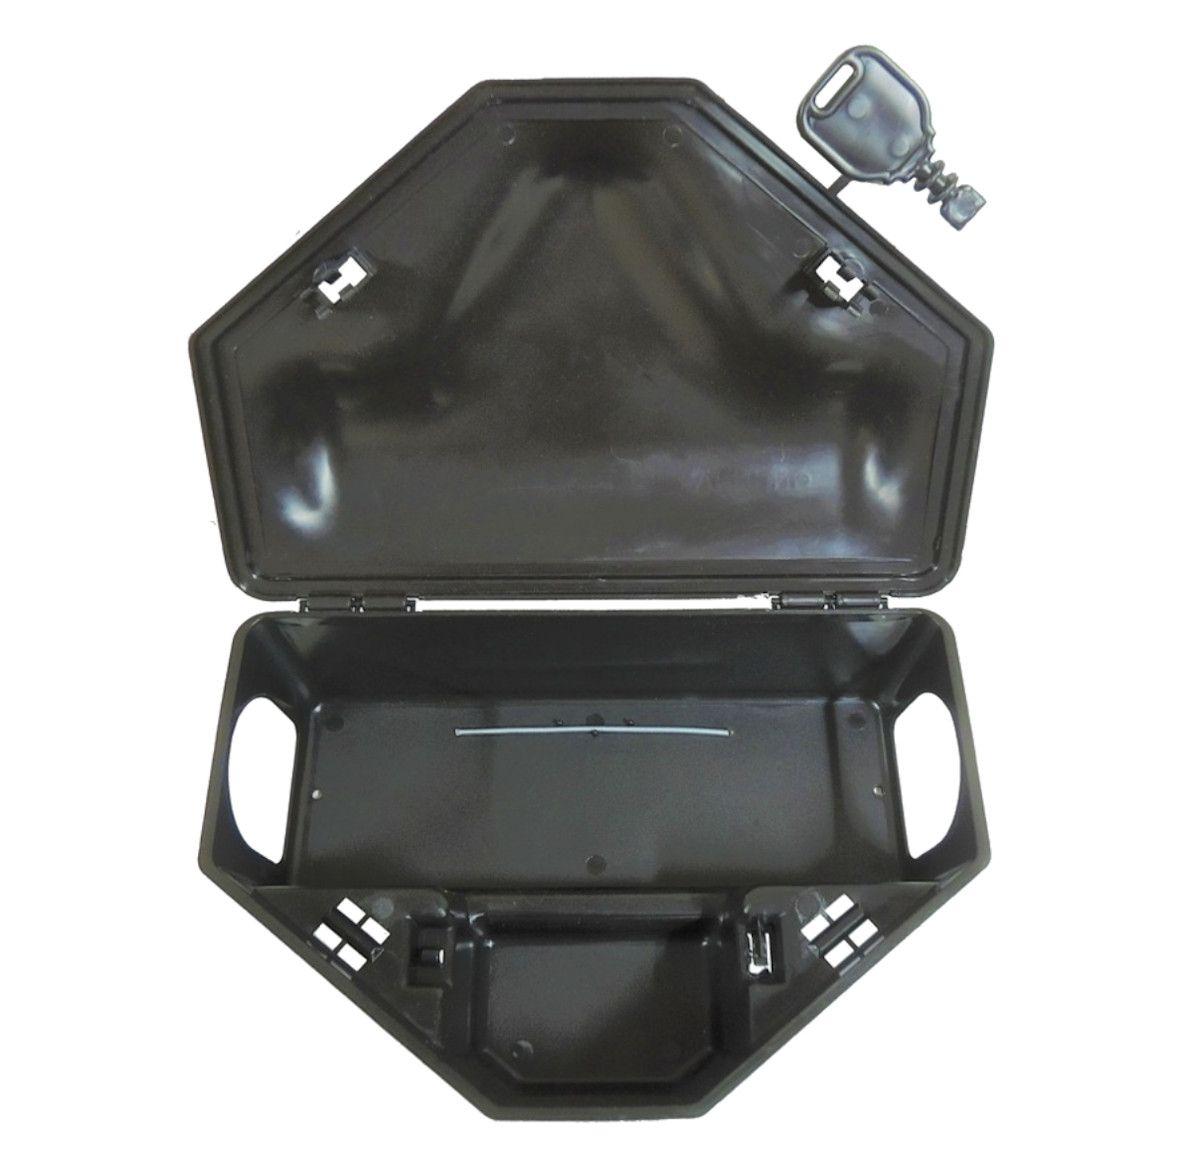 Kit 50 Porta Iscas Travamento Duplo + 2 Kg Semente Girassol